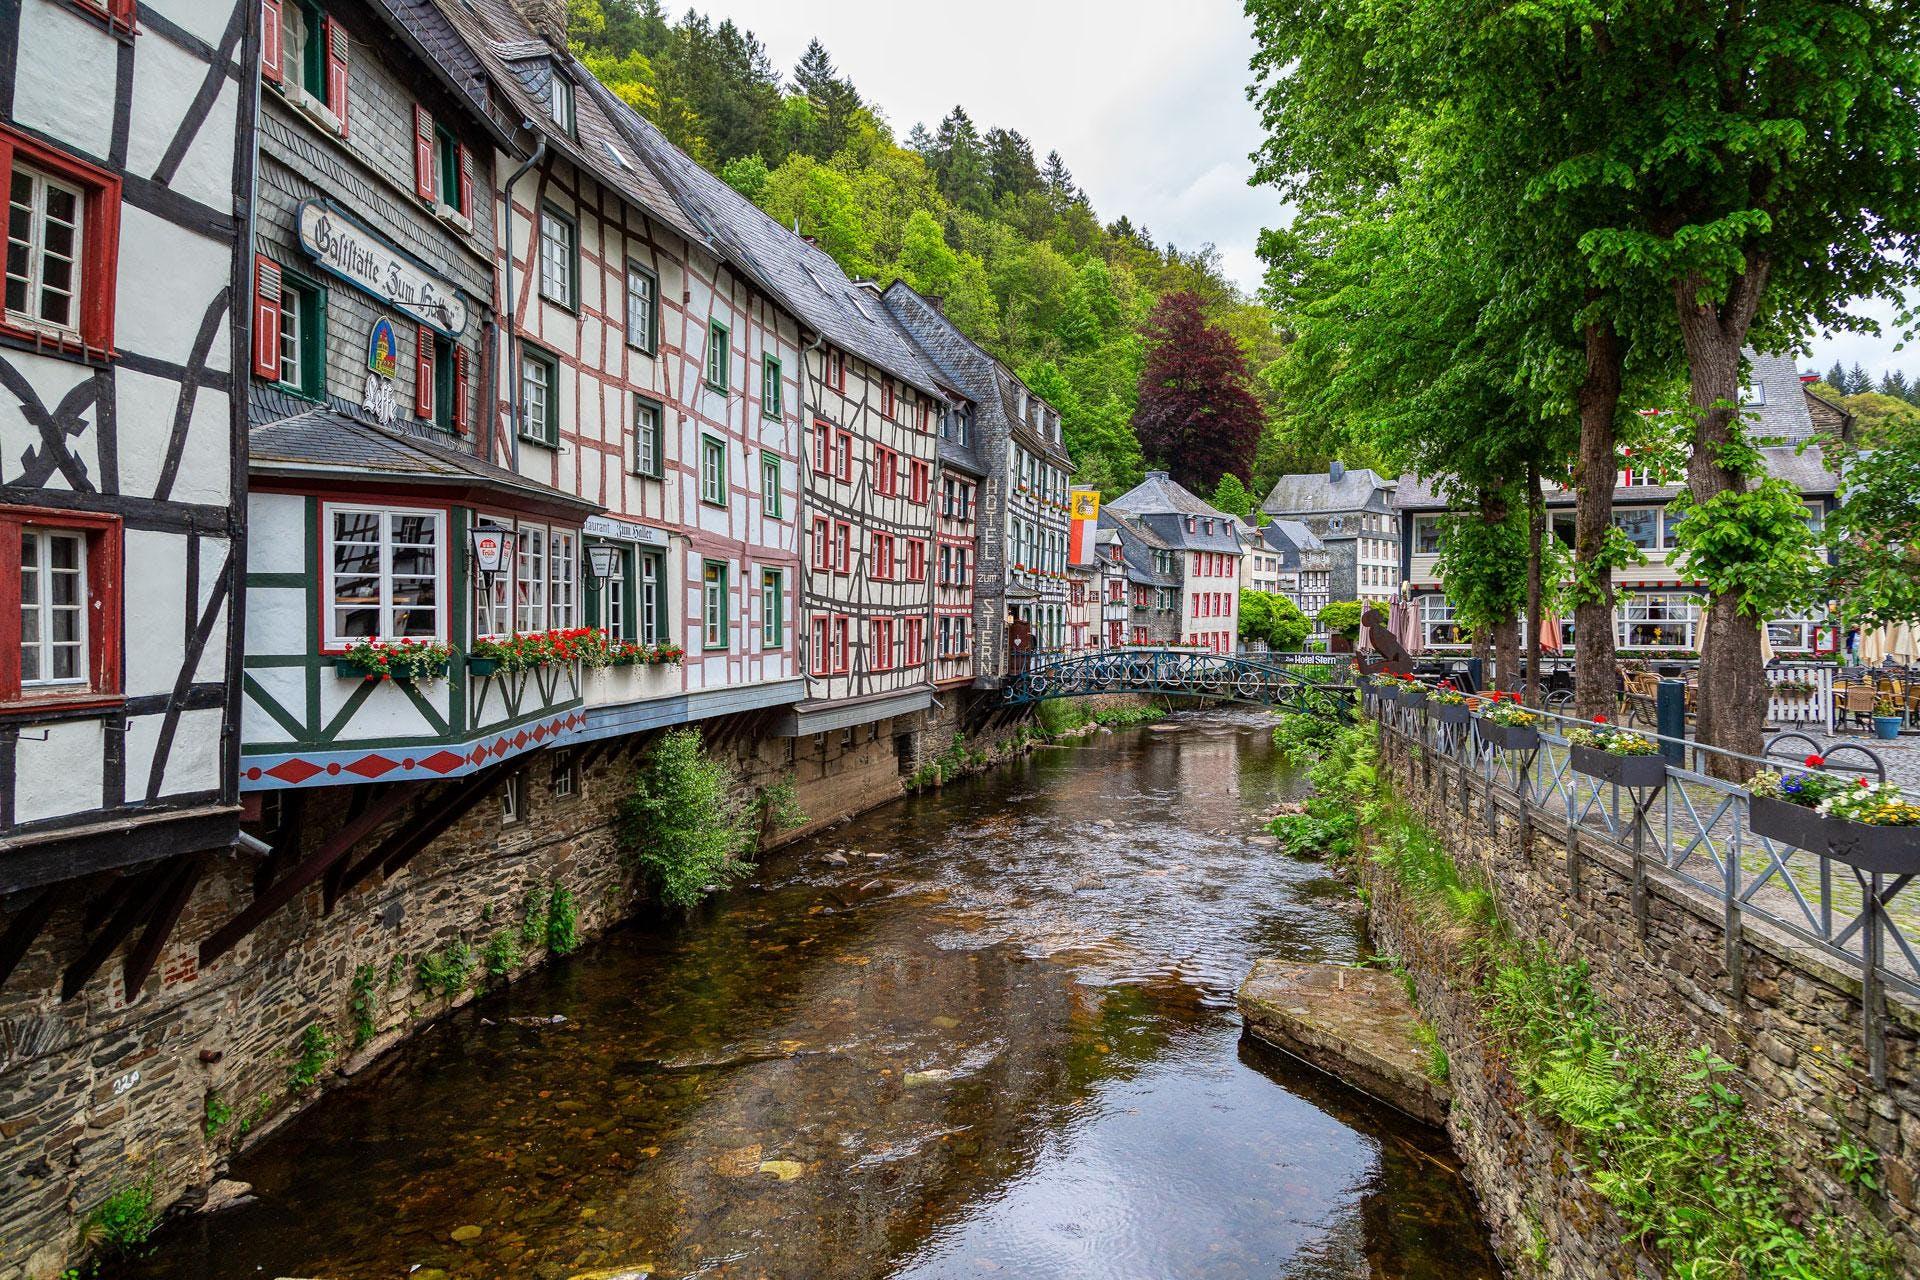 Princeton Photo Workshop: North Rhine-Westphalia-Photokina Photography Tour